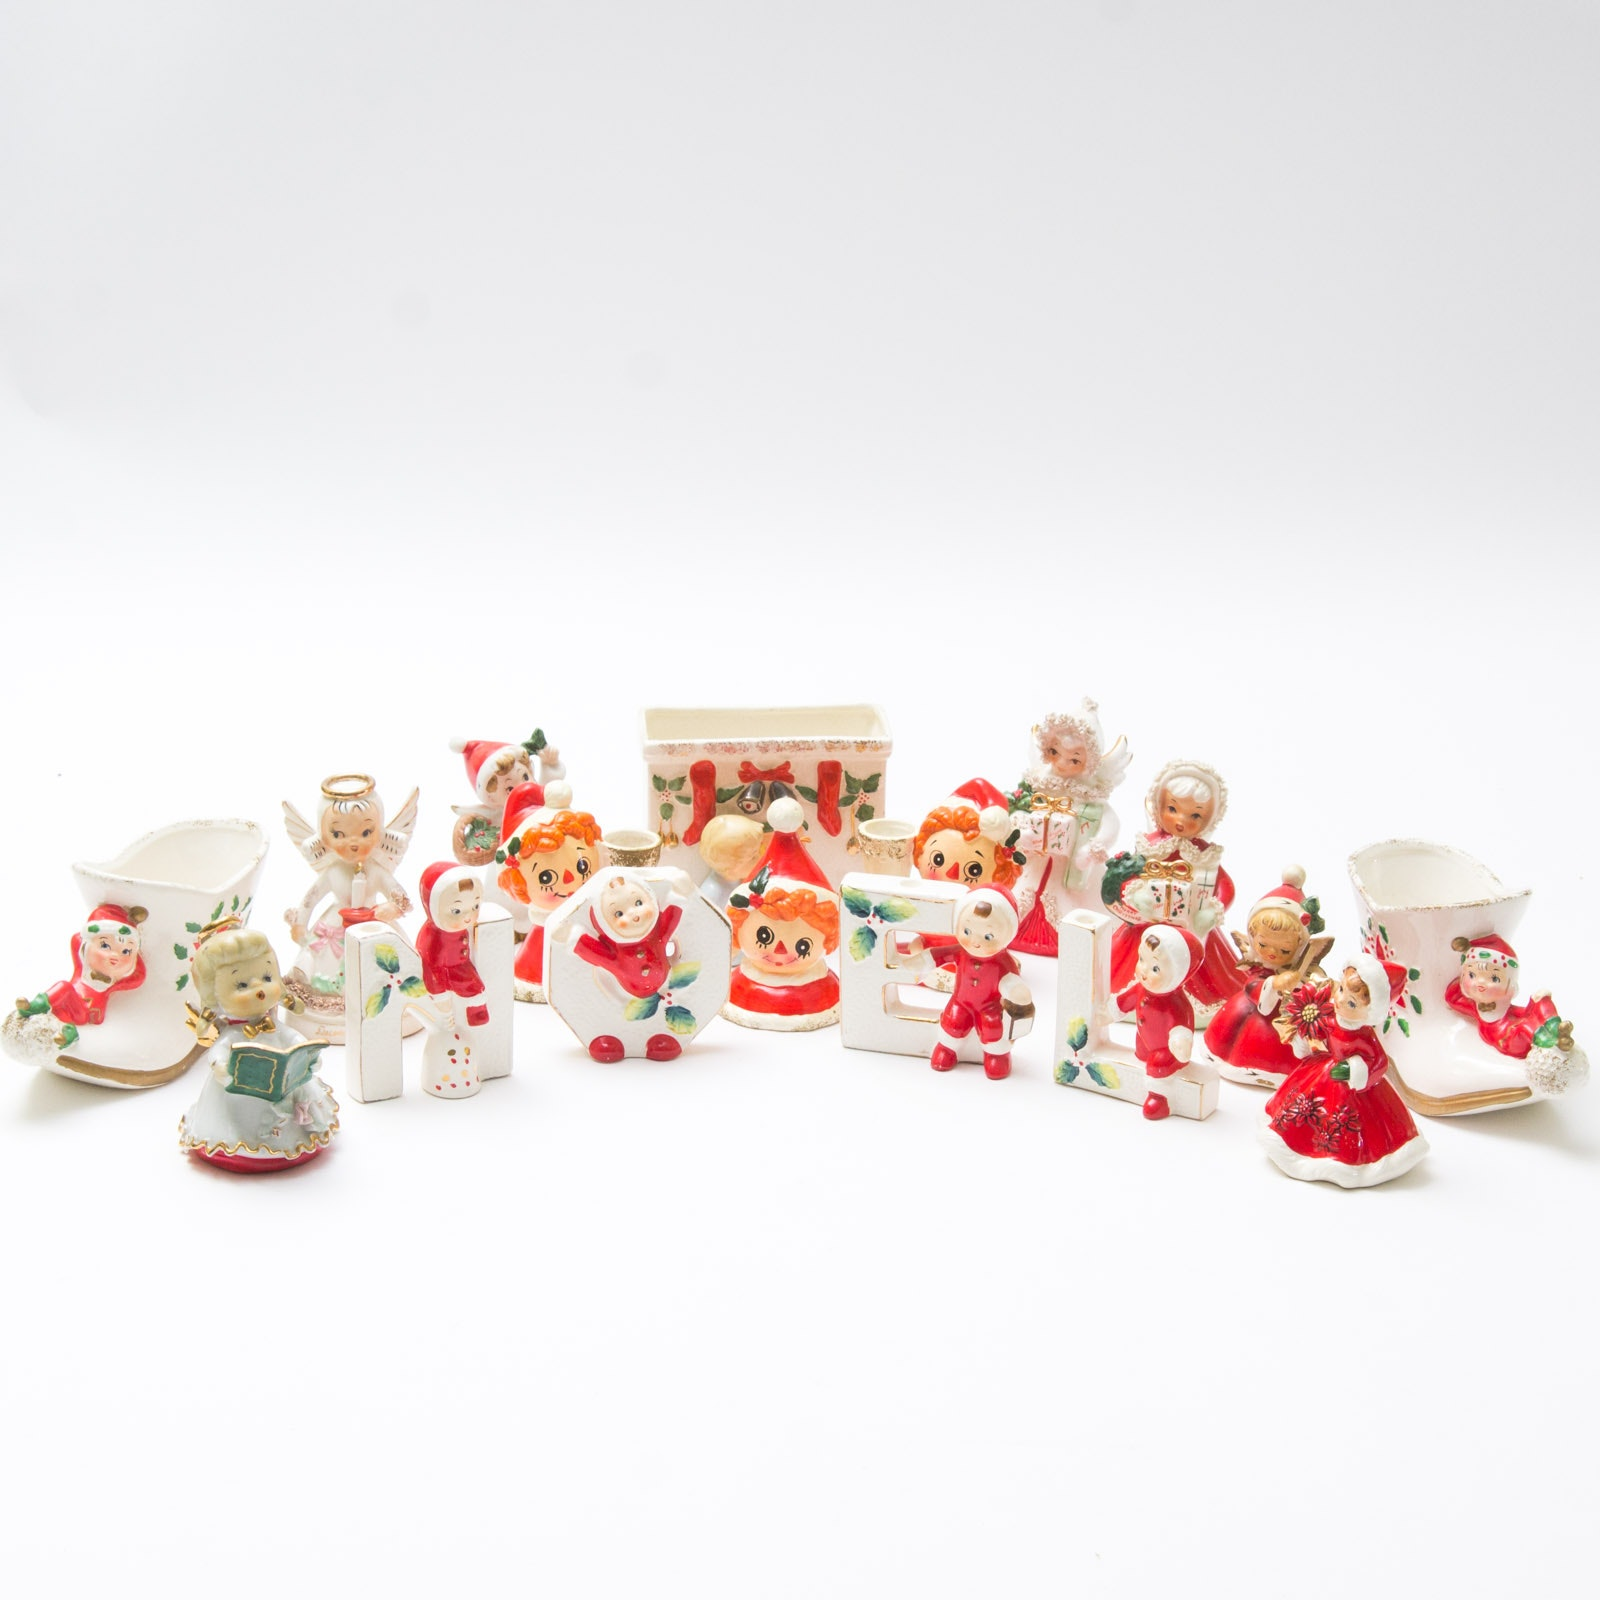 Grouping of Napcoware Christmas Figurines